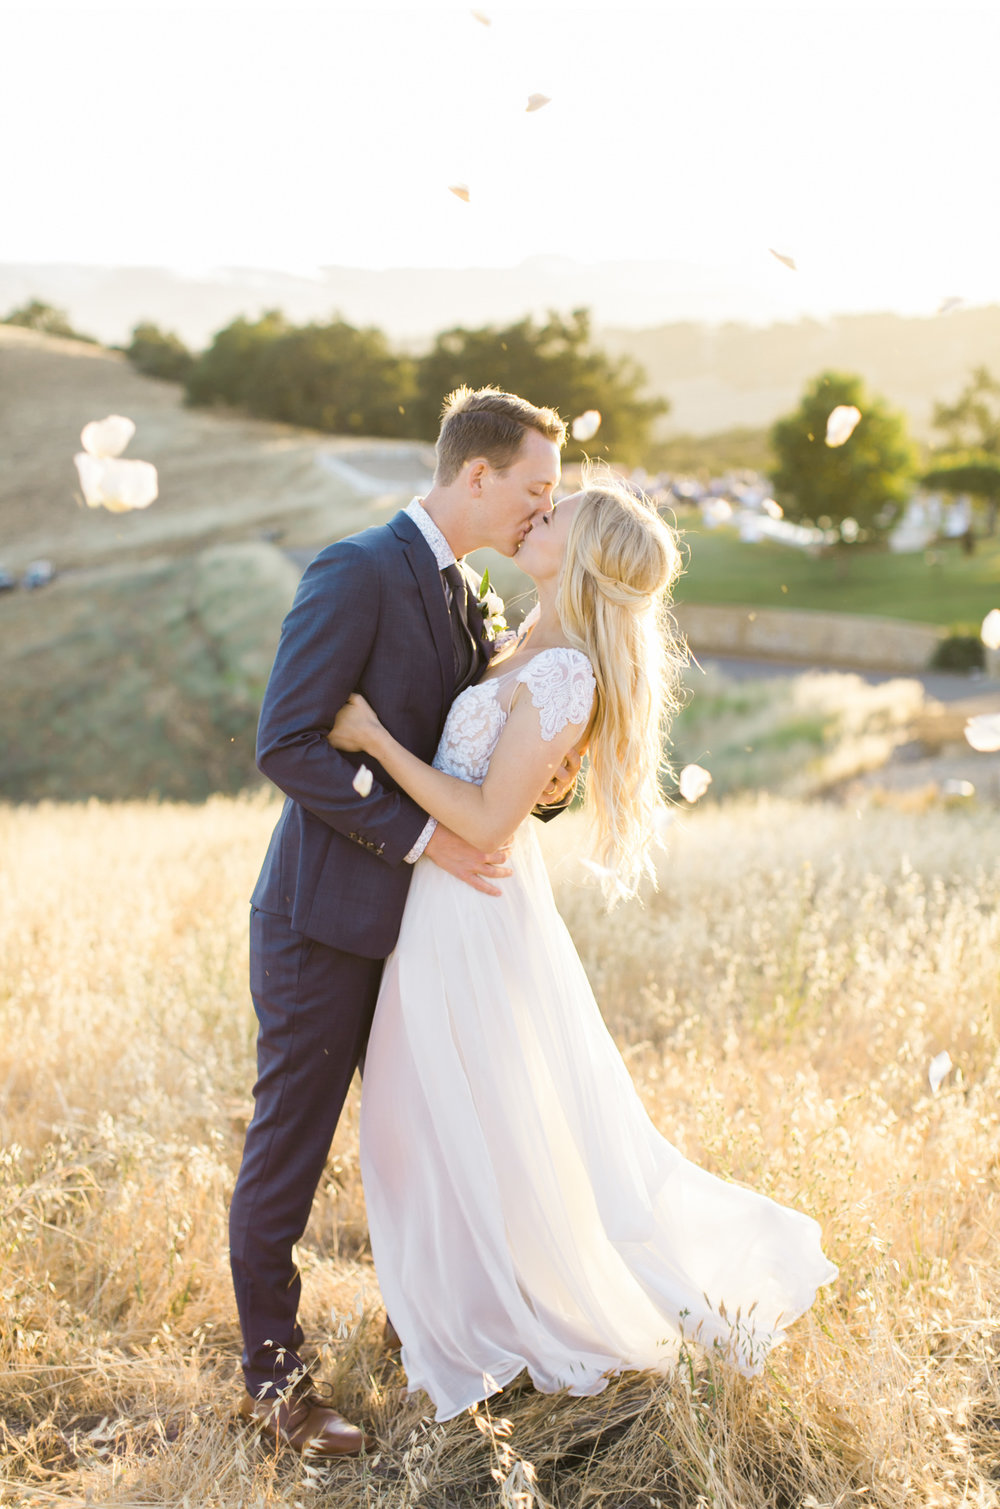 Style-Me-Pretty-California-Wedding-San-Luis-Obispo-Paso-Robles-Natalie-Schutt-Photography_19.jpg